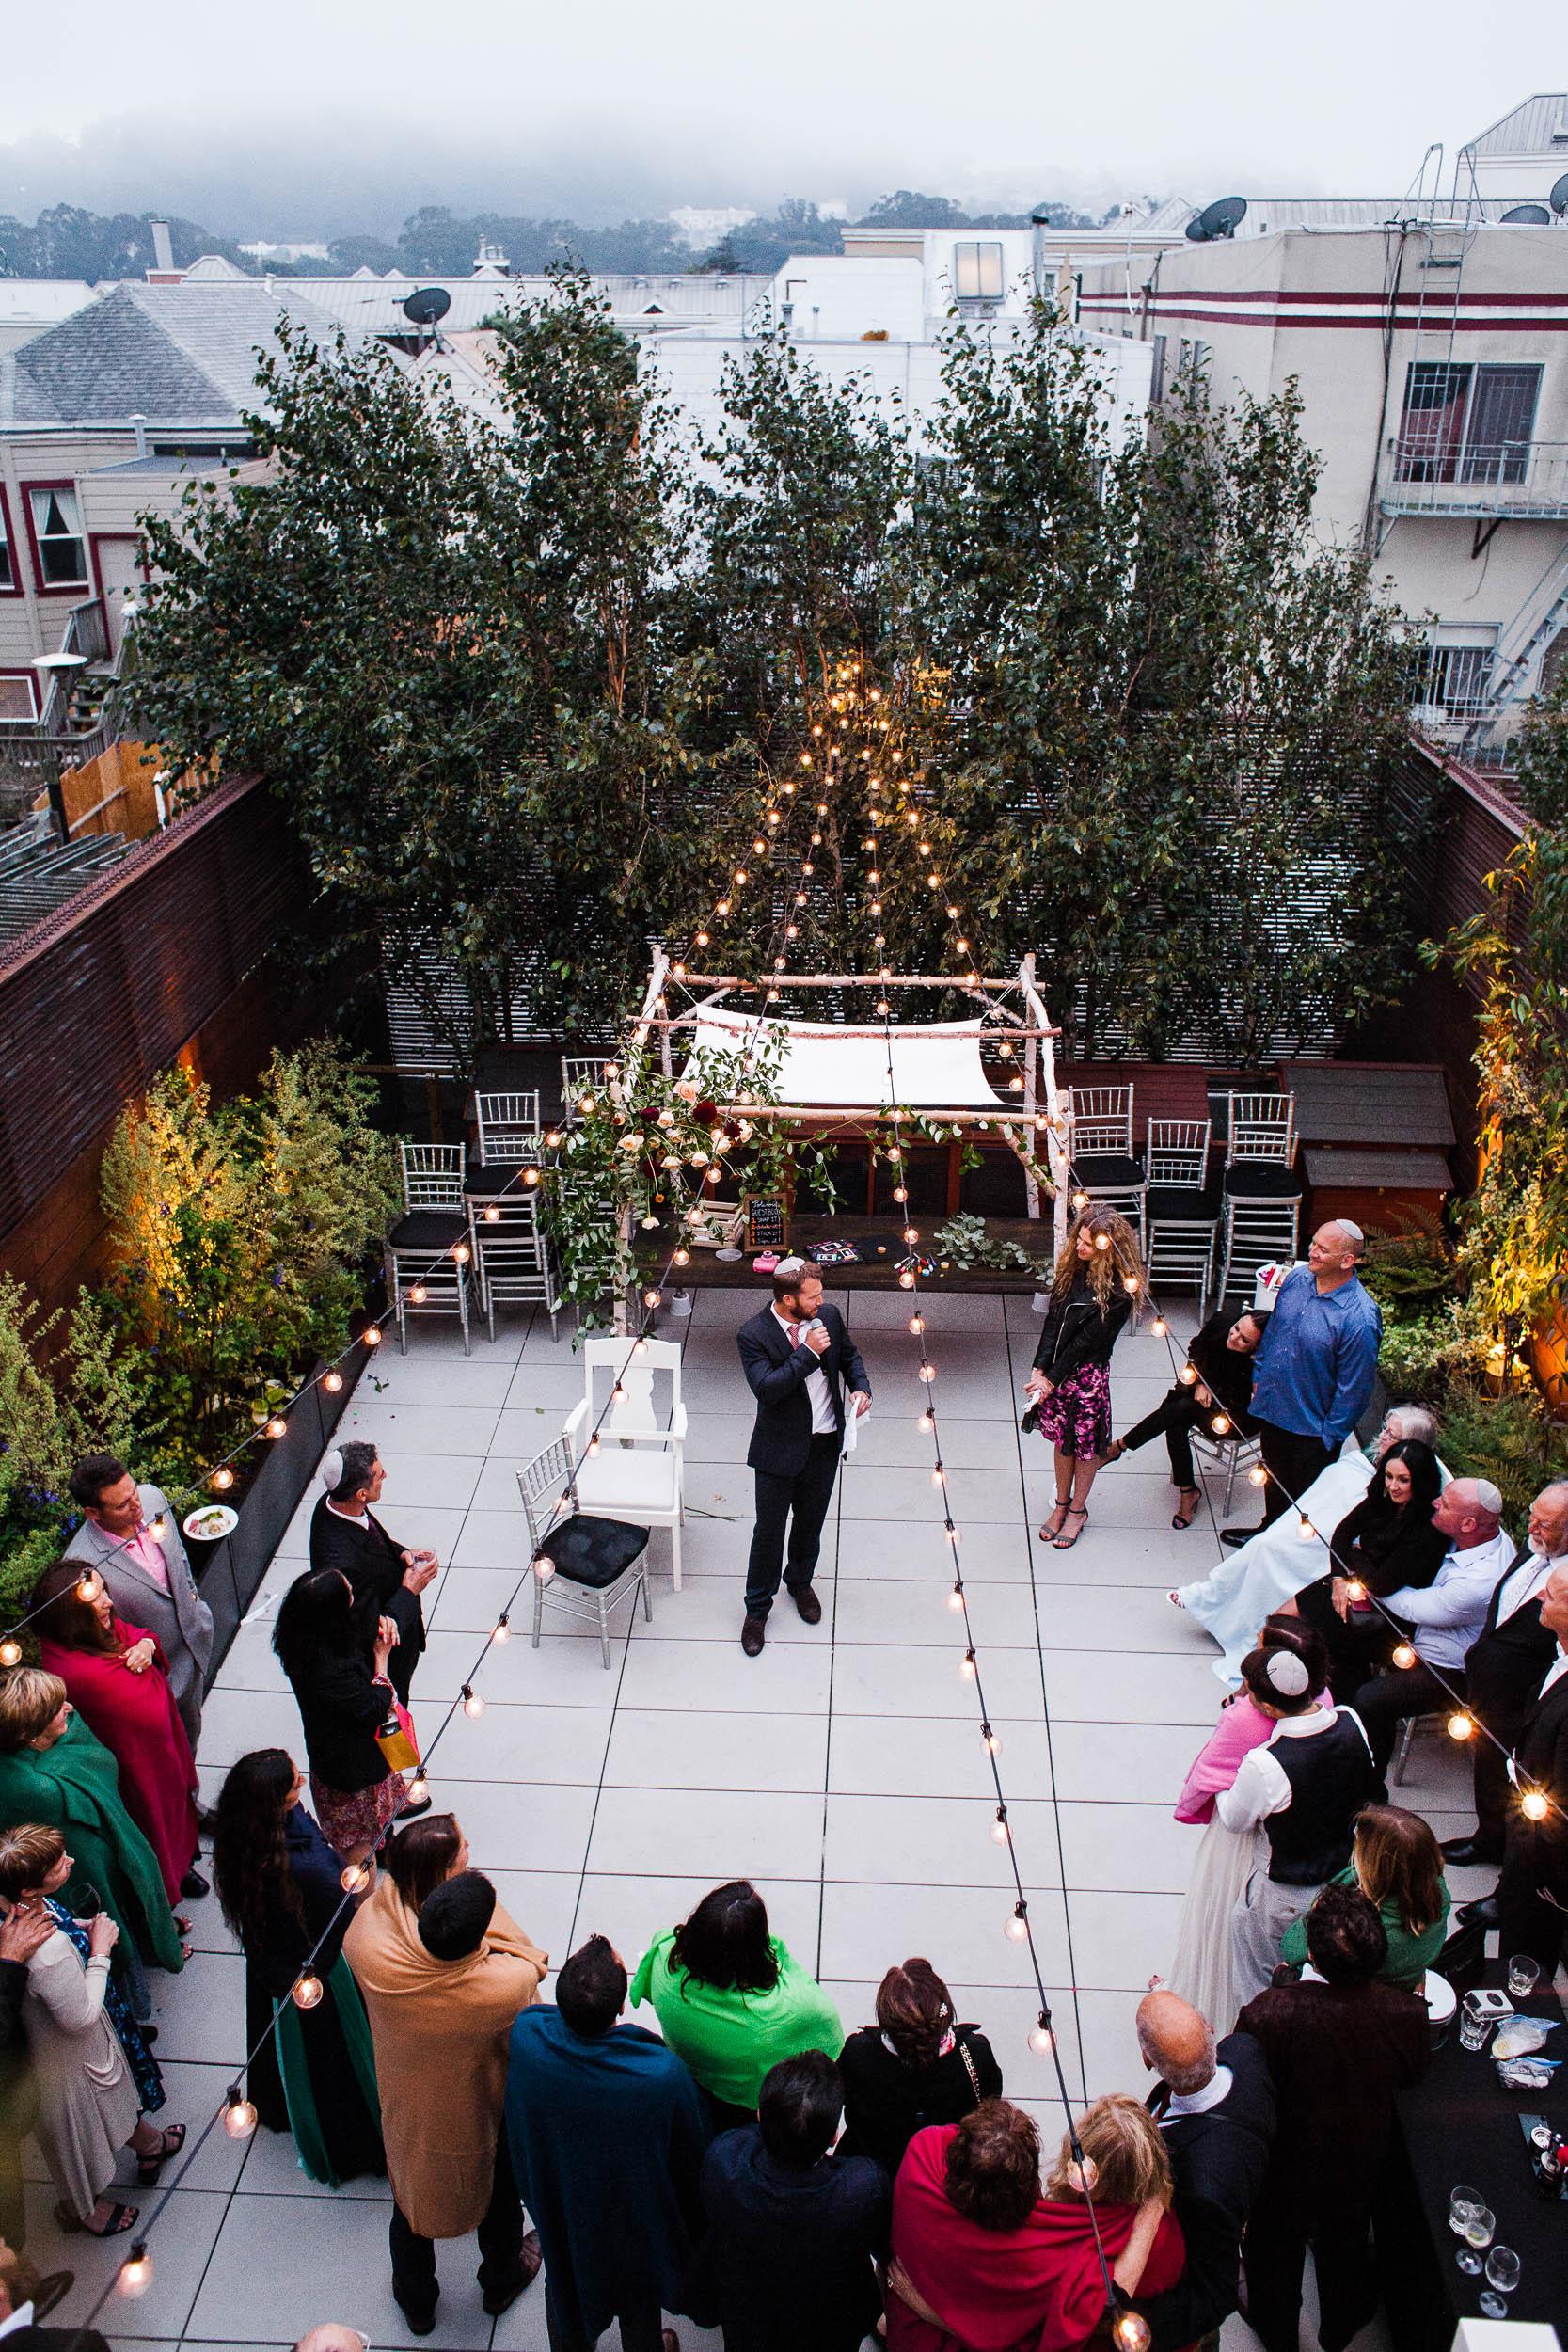 081818_Alina Jason San Francisco Wedding_Buena Lane Photography_3060 copy.jpg